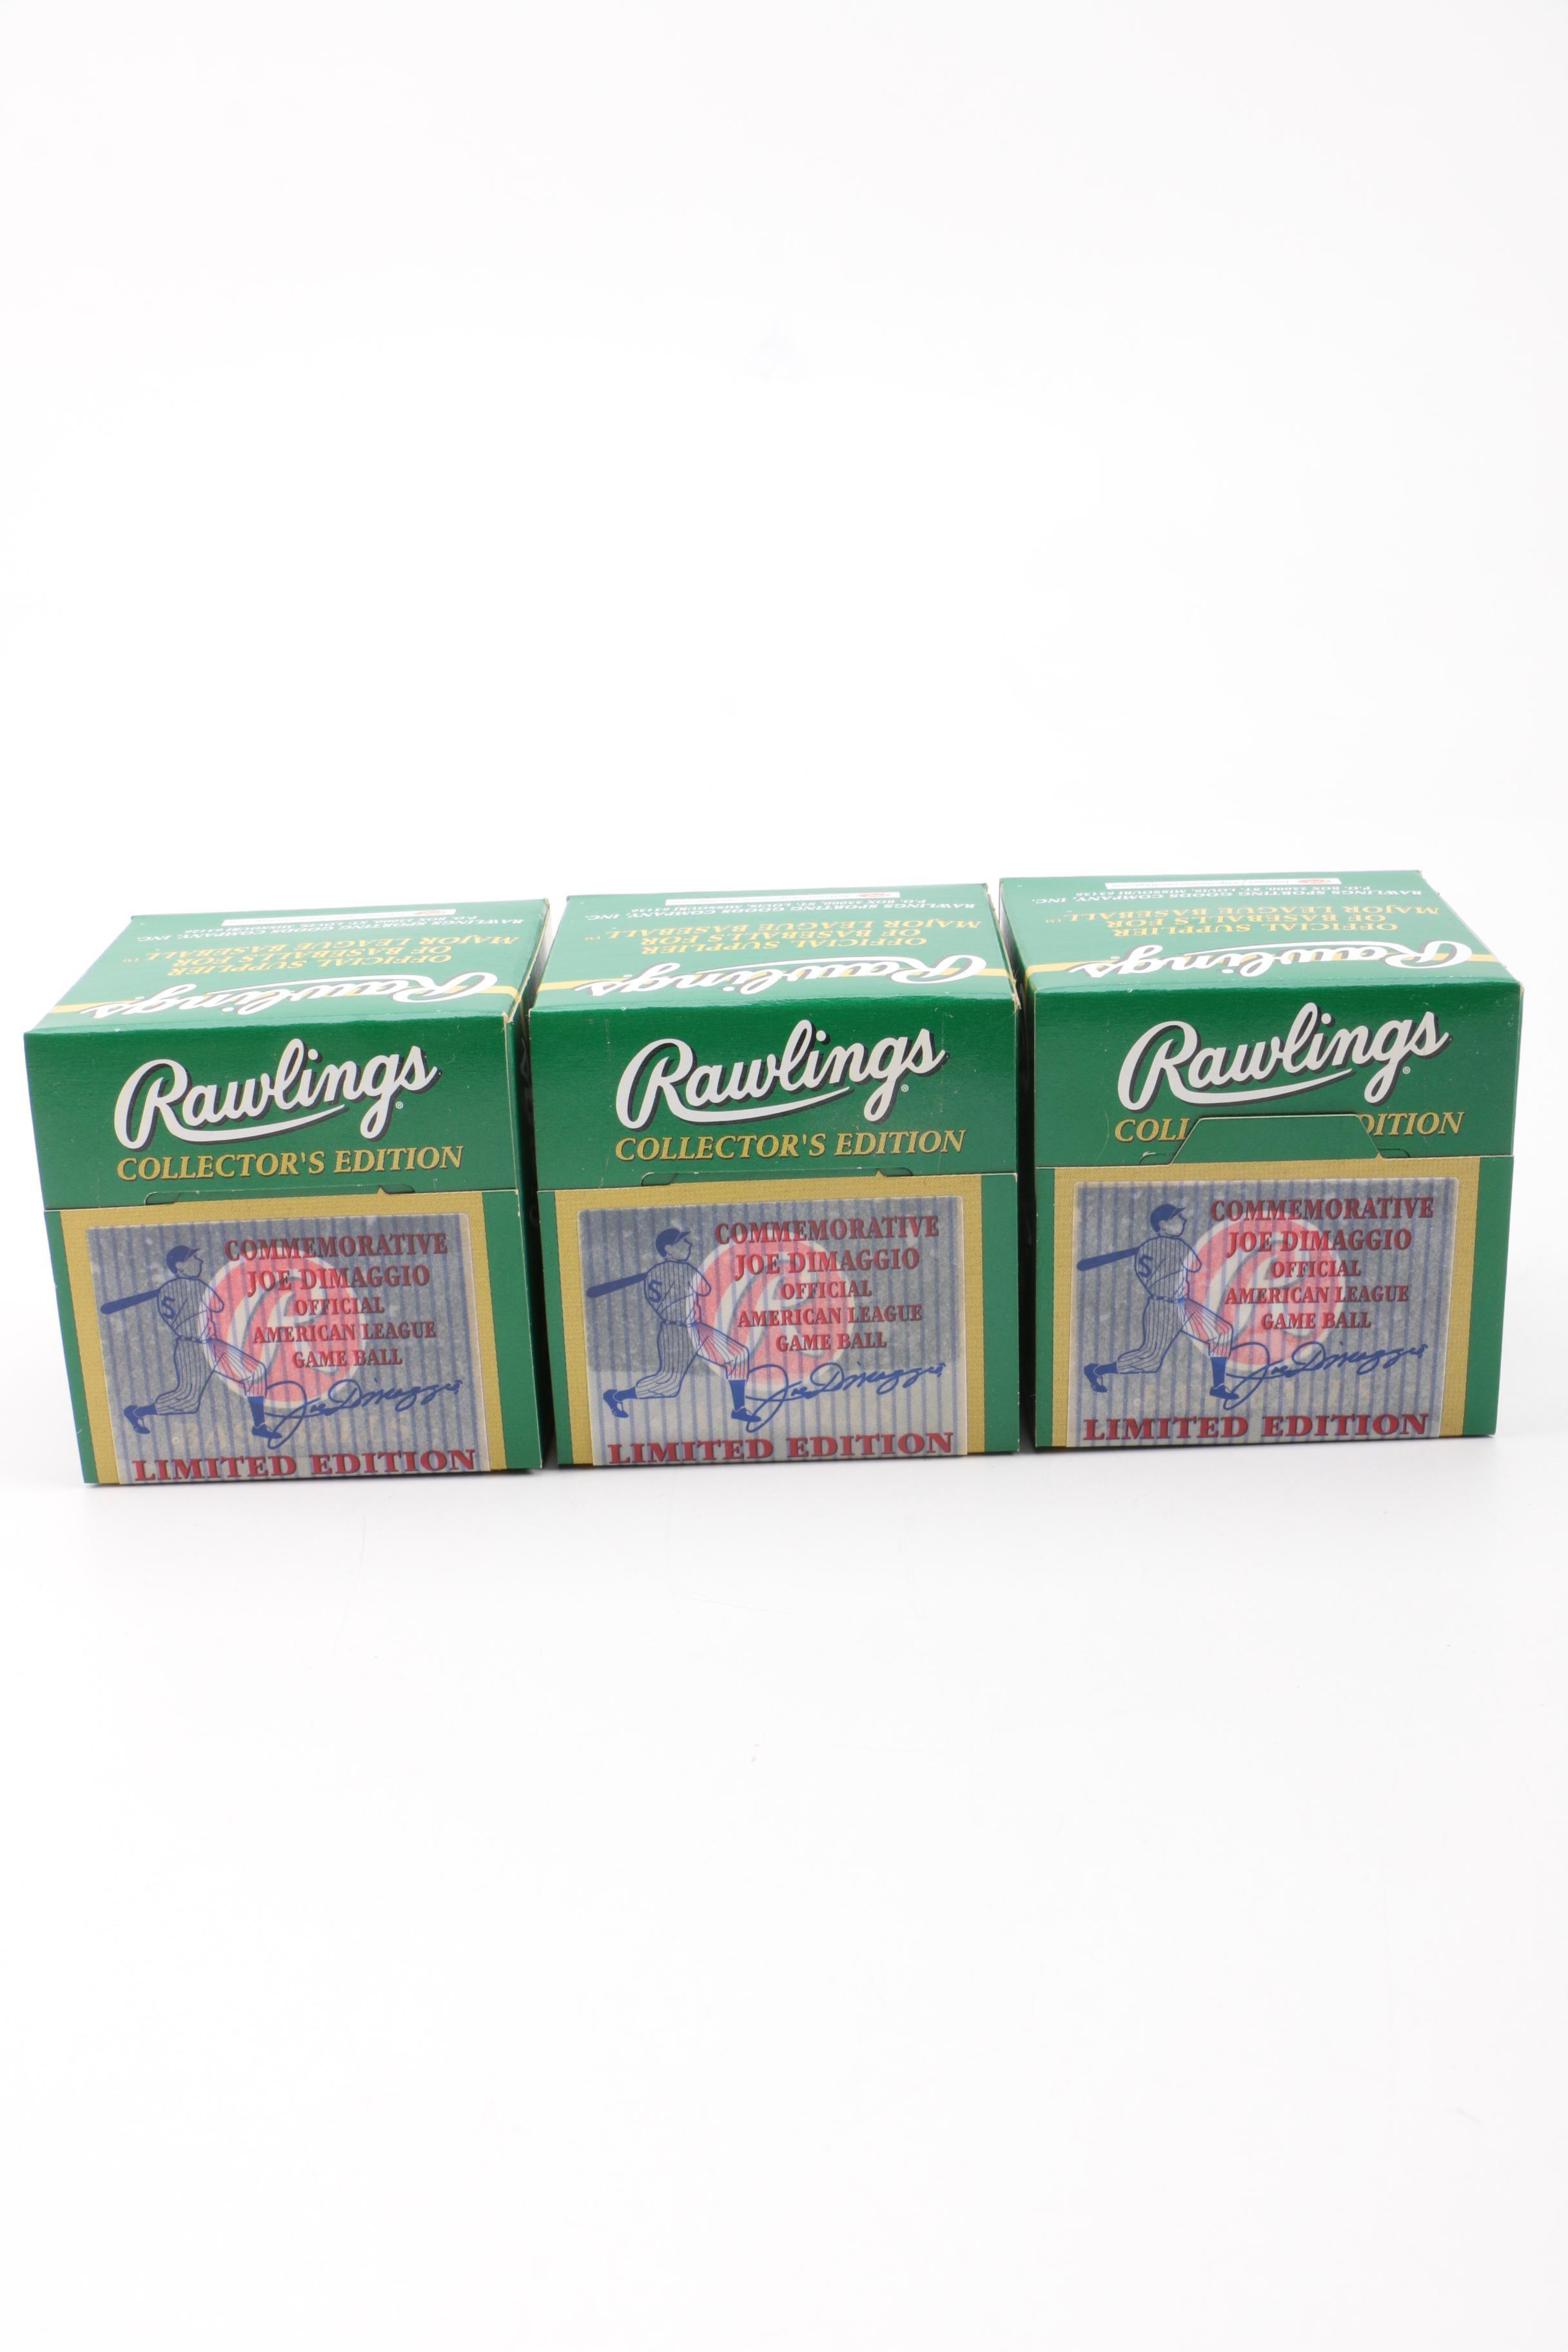 Rawlings Collector's Edition Joe DiMaggio Baseballs